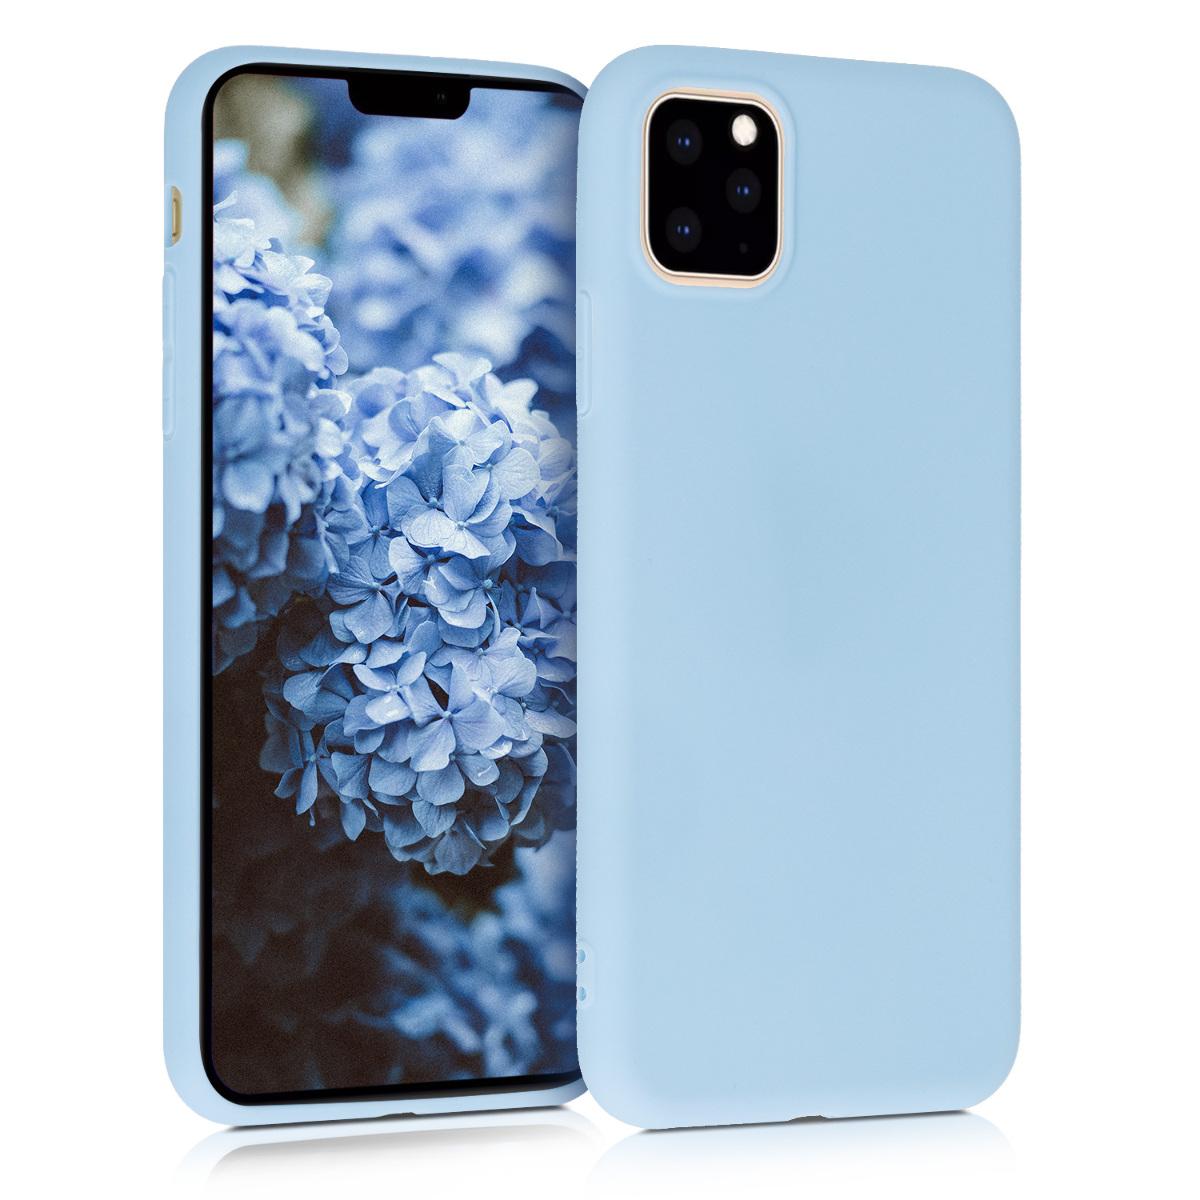 KW Θήκη Σιλικόνης iPhone 11 Pro Max - Light Blue Matte (49789.58)